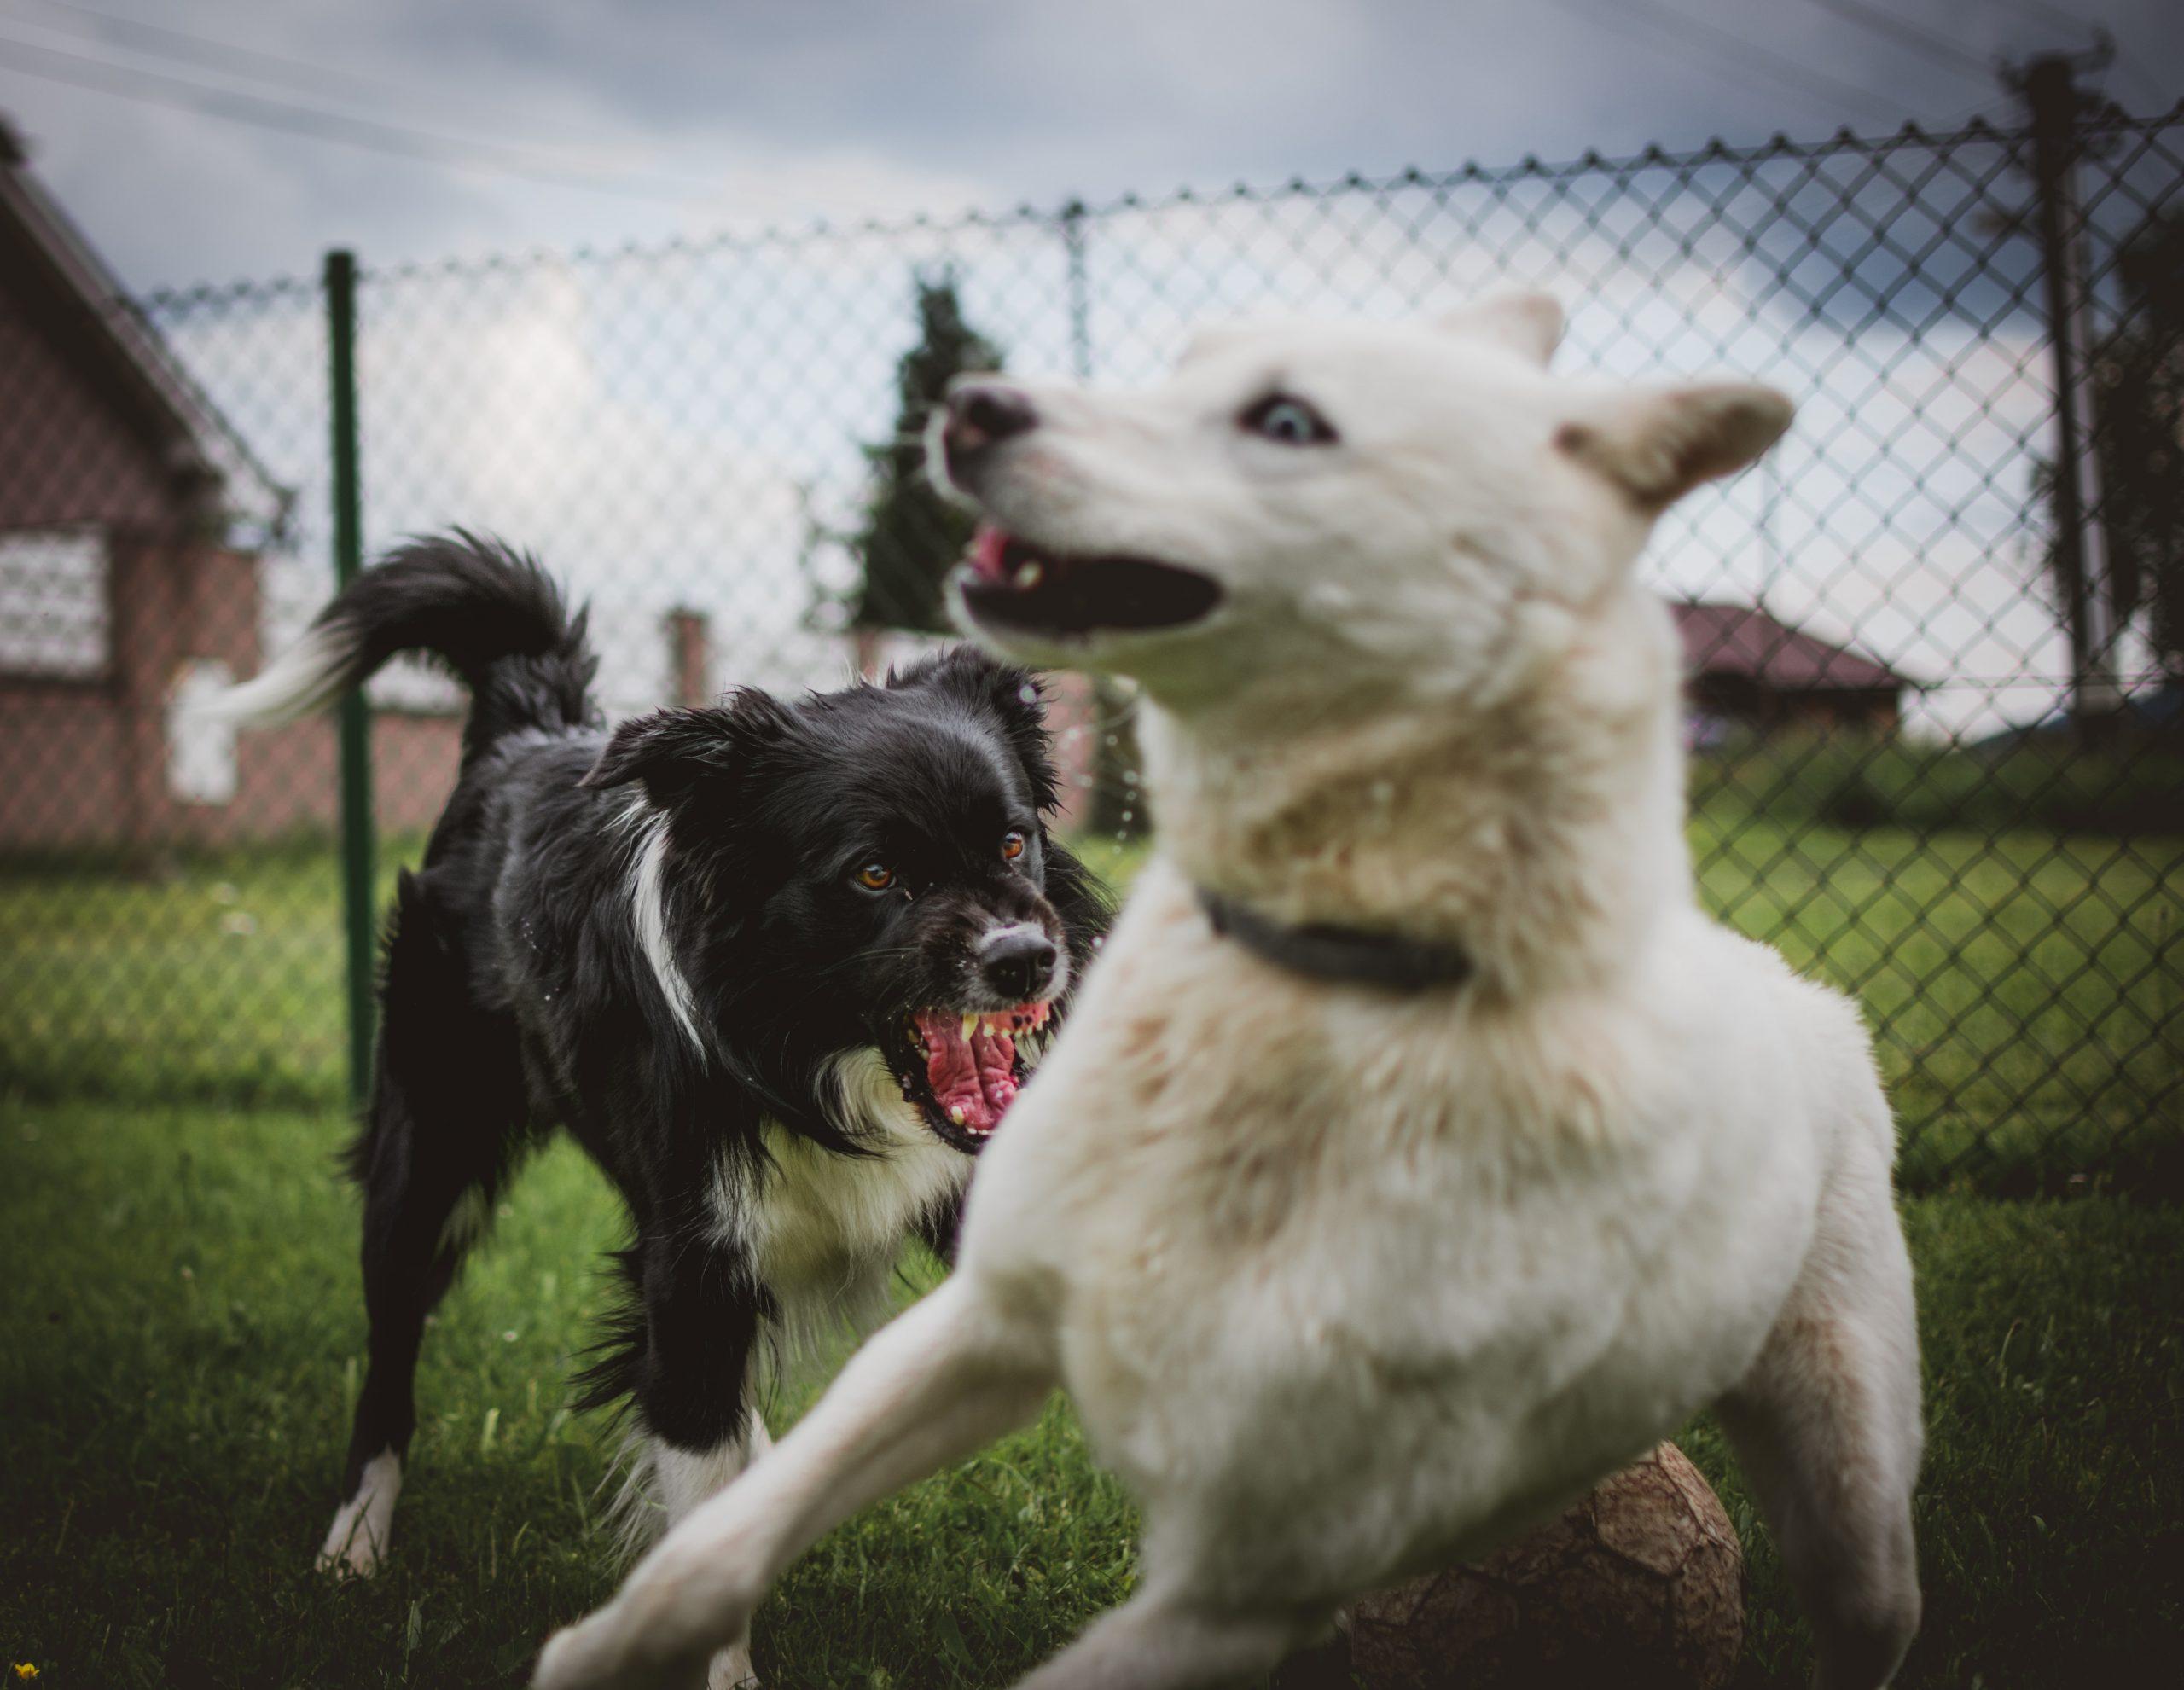 Avoiding Aggressive Dogs